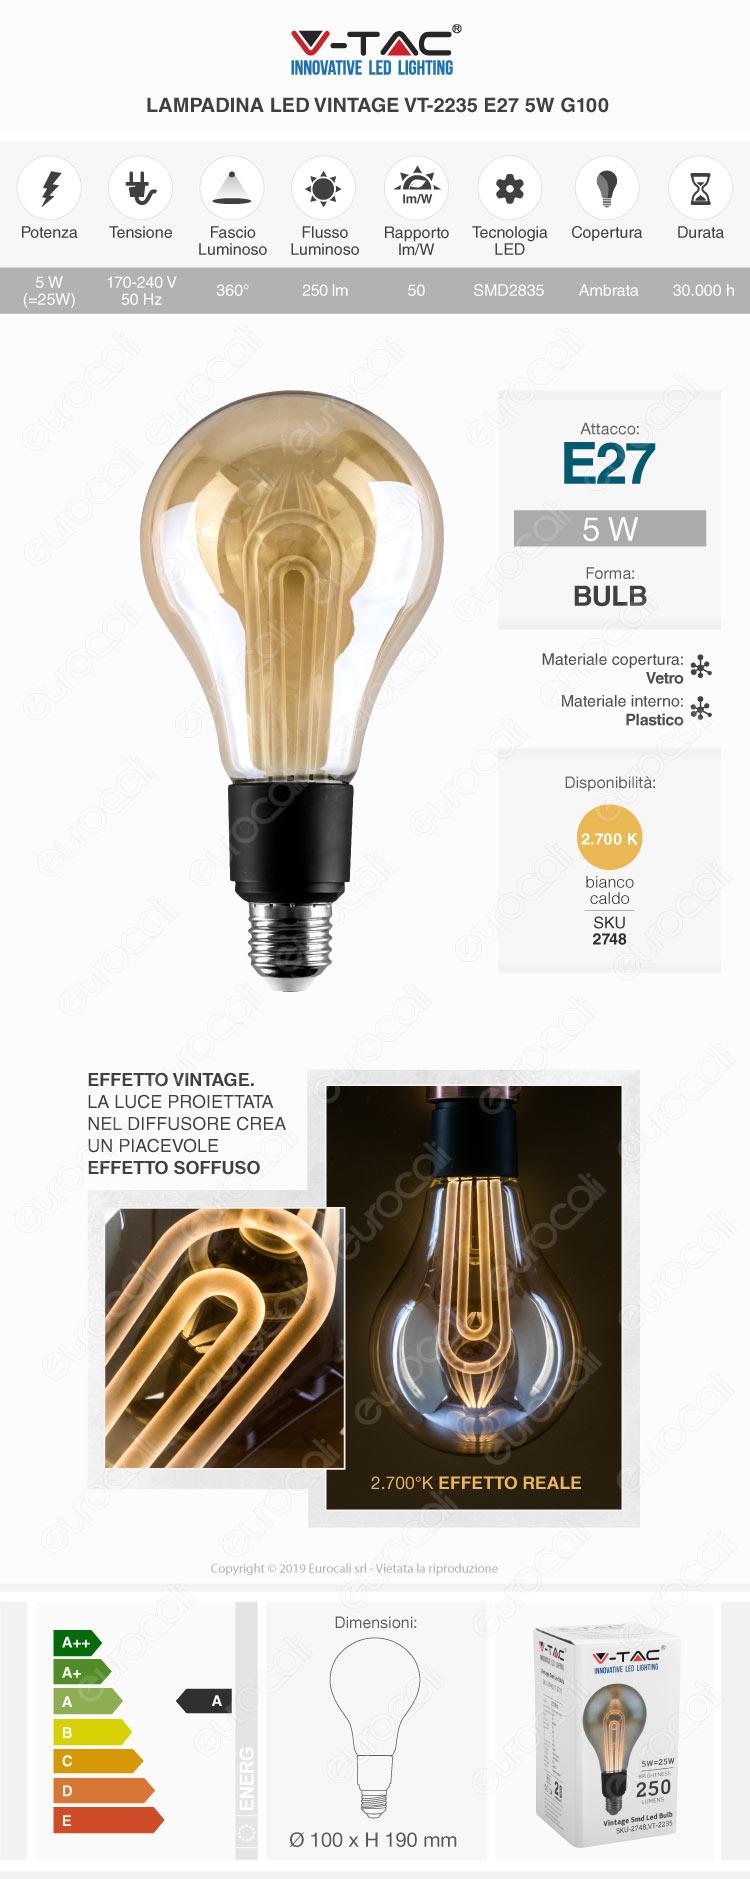 V-Tac VT-2185 Lampadina LED E27 4W Bulb ST64 Ambrata con Incisioni Laser